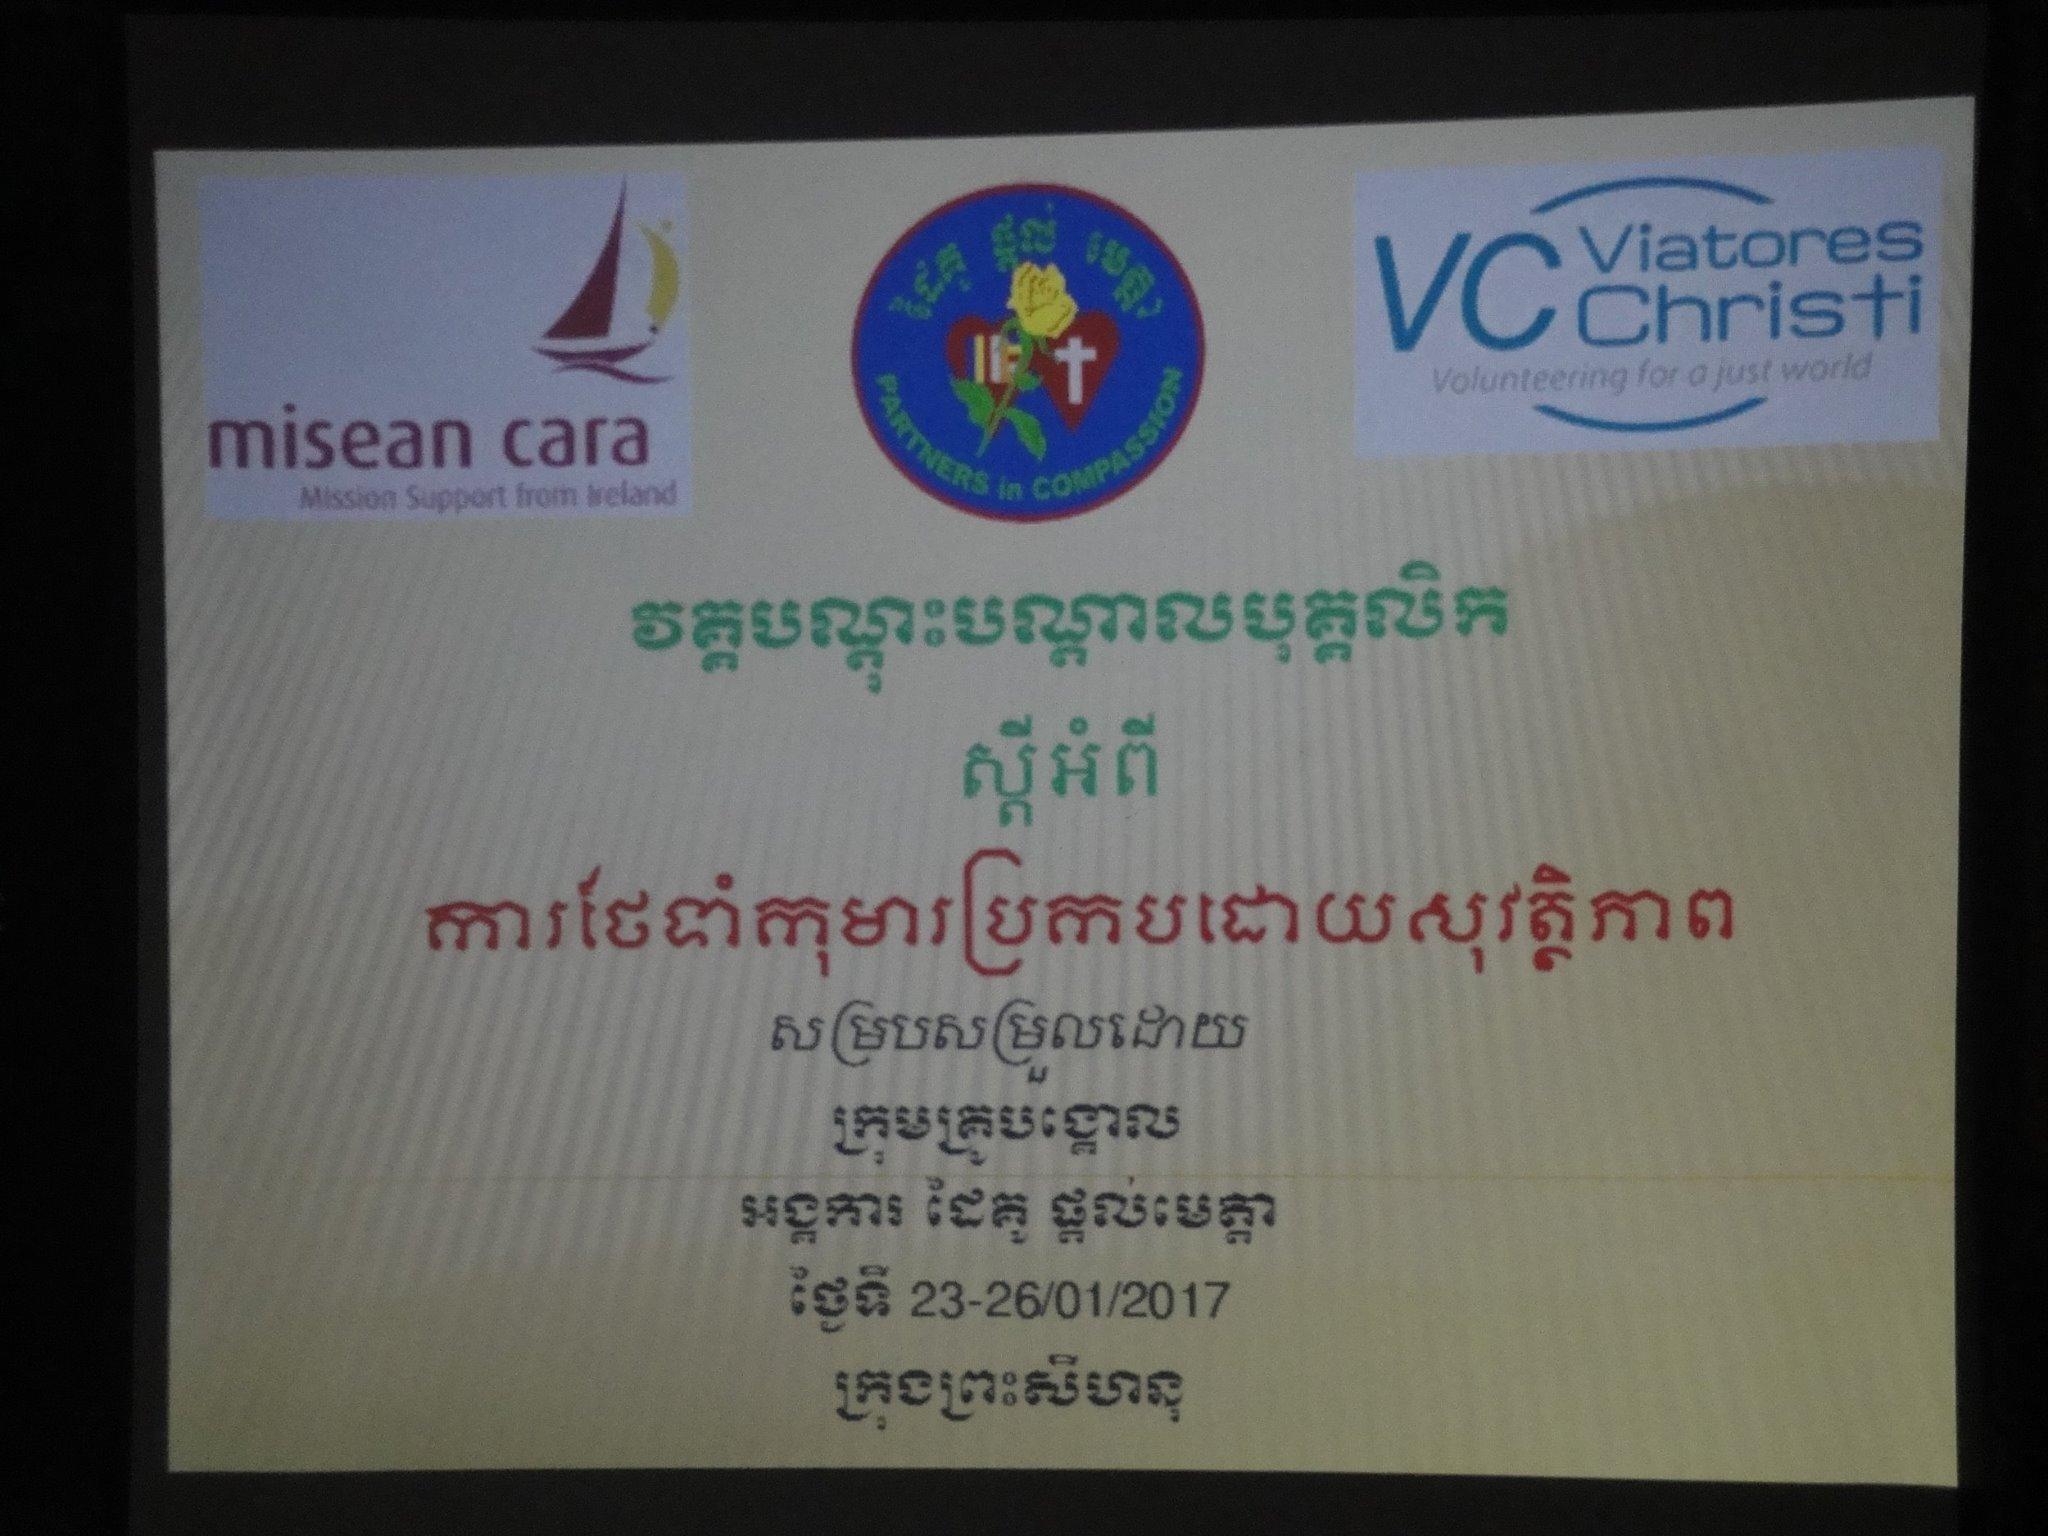 Patrick Mooney - Cambodia